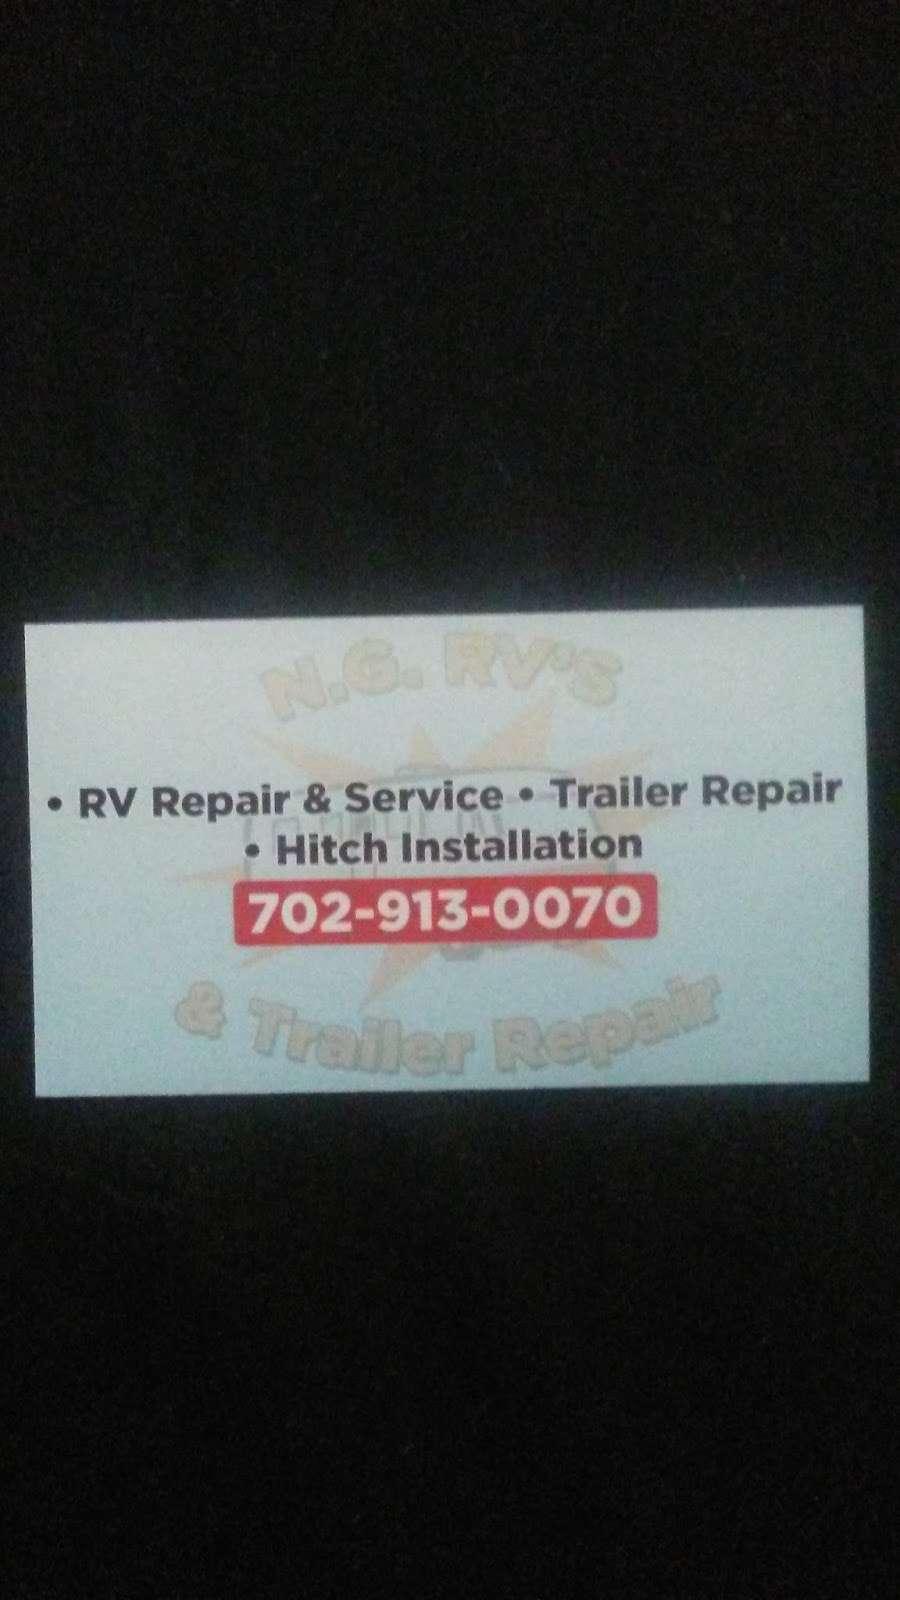 NG RV & Trailer Repair - car repair  | Photo 10 of 10 | Address: 3796 W Edward Ave, Las Vegas, NV 89108, USA | Phone: (702) 913-0070